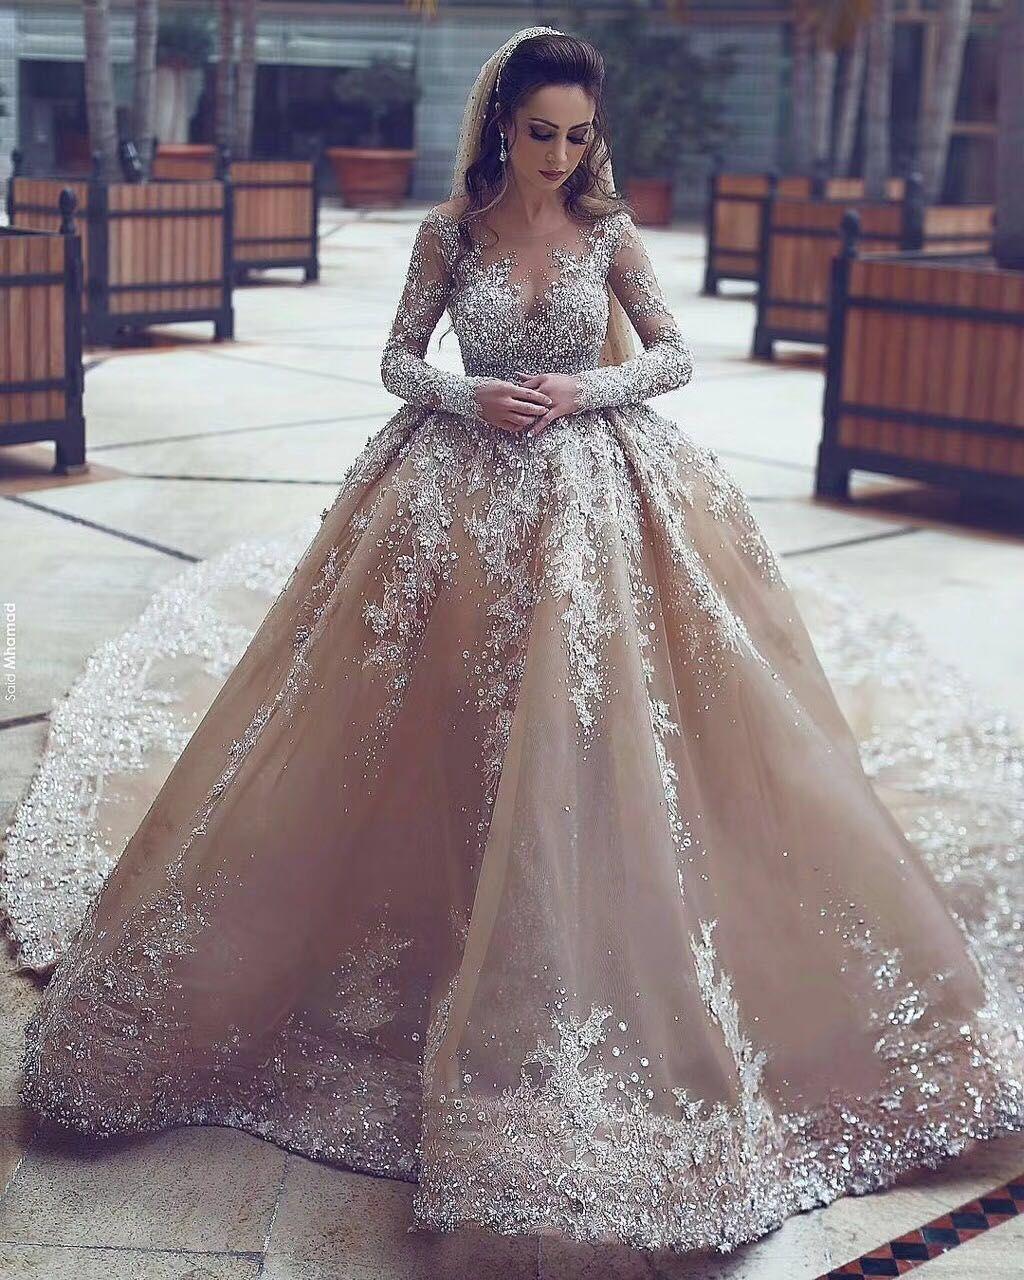 Großhandel Arabisch Dubai Kristalle Stark Bestickt Ballkleid ...